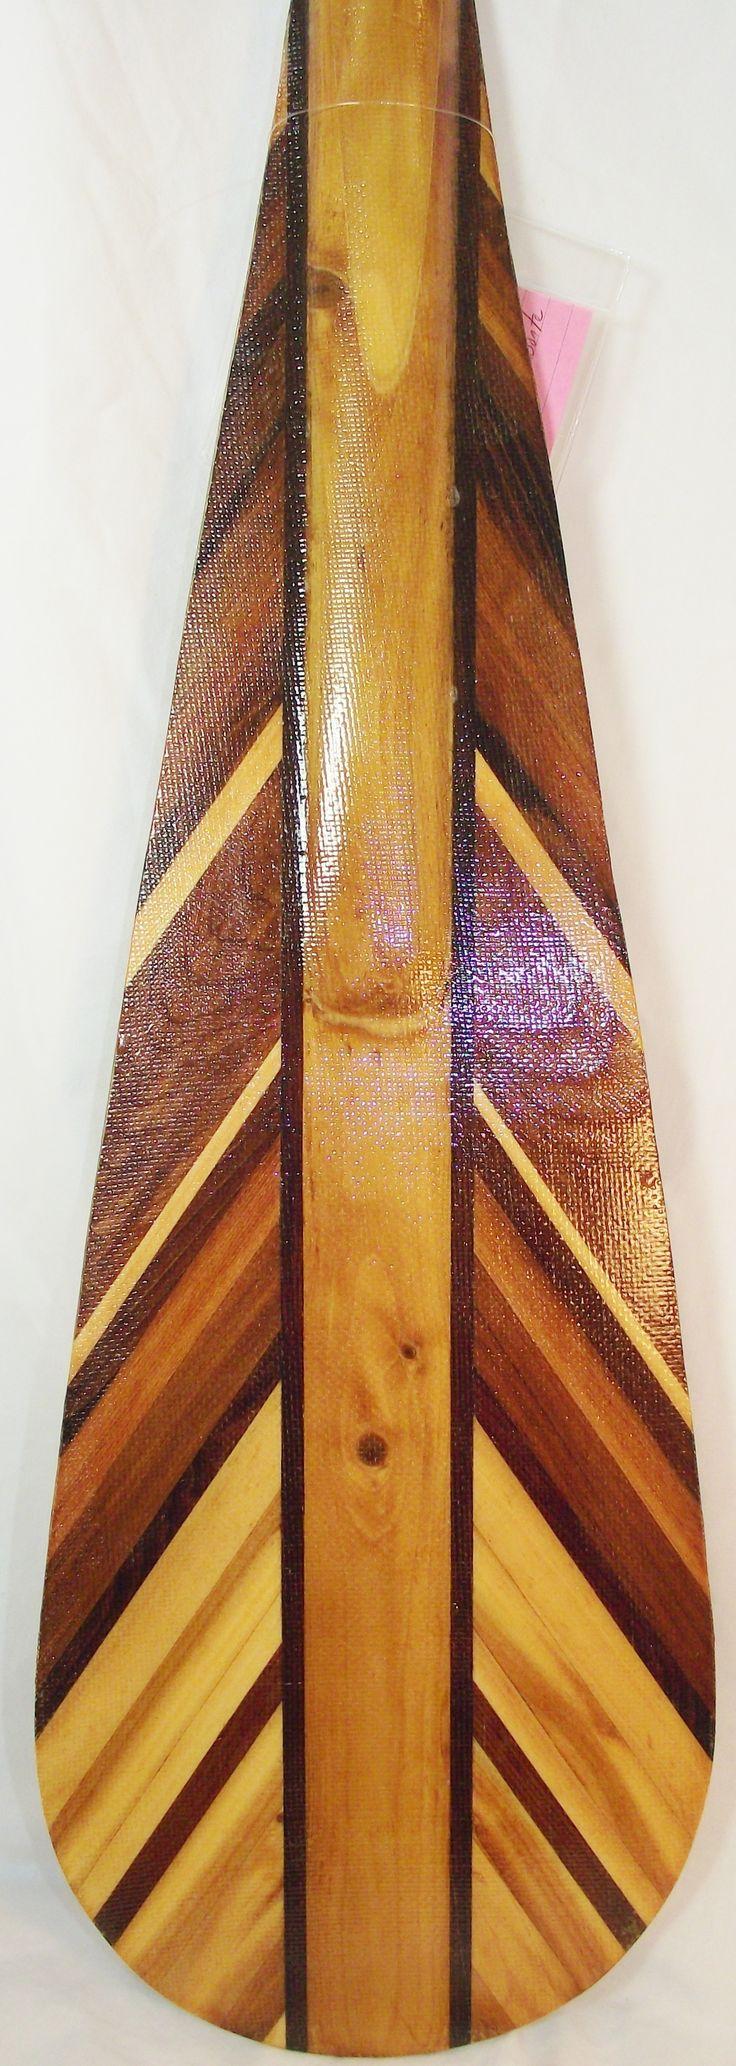 Gorgeous Muskoka made paddle.